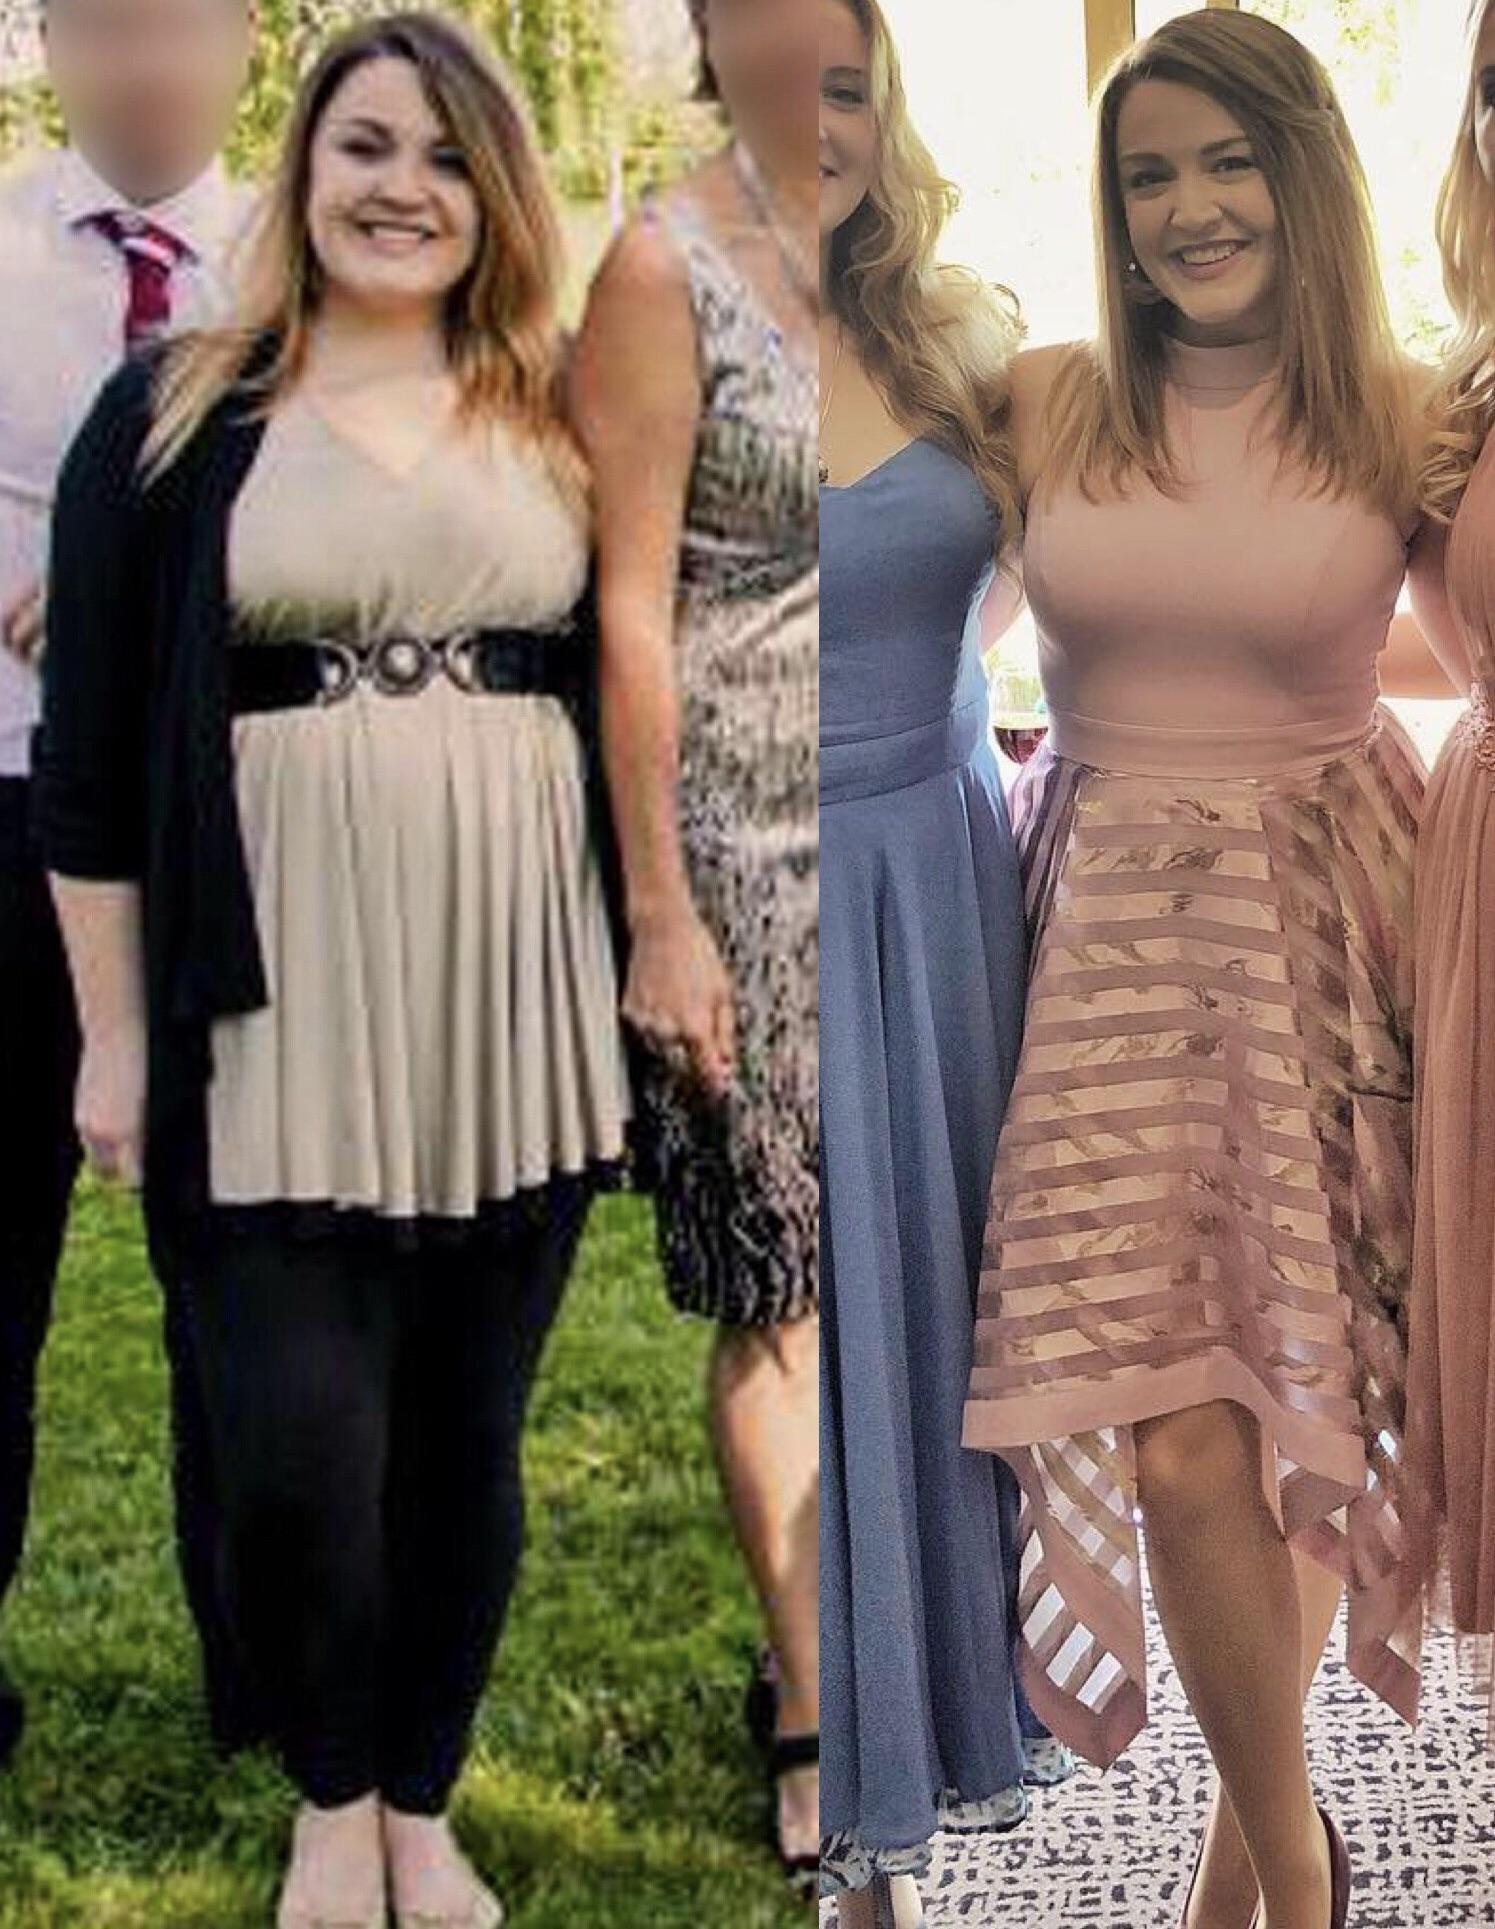 5 feet 4 Female Progress Pics of 50 lbs Weight Loss 190 lbs to 140 lbs